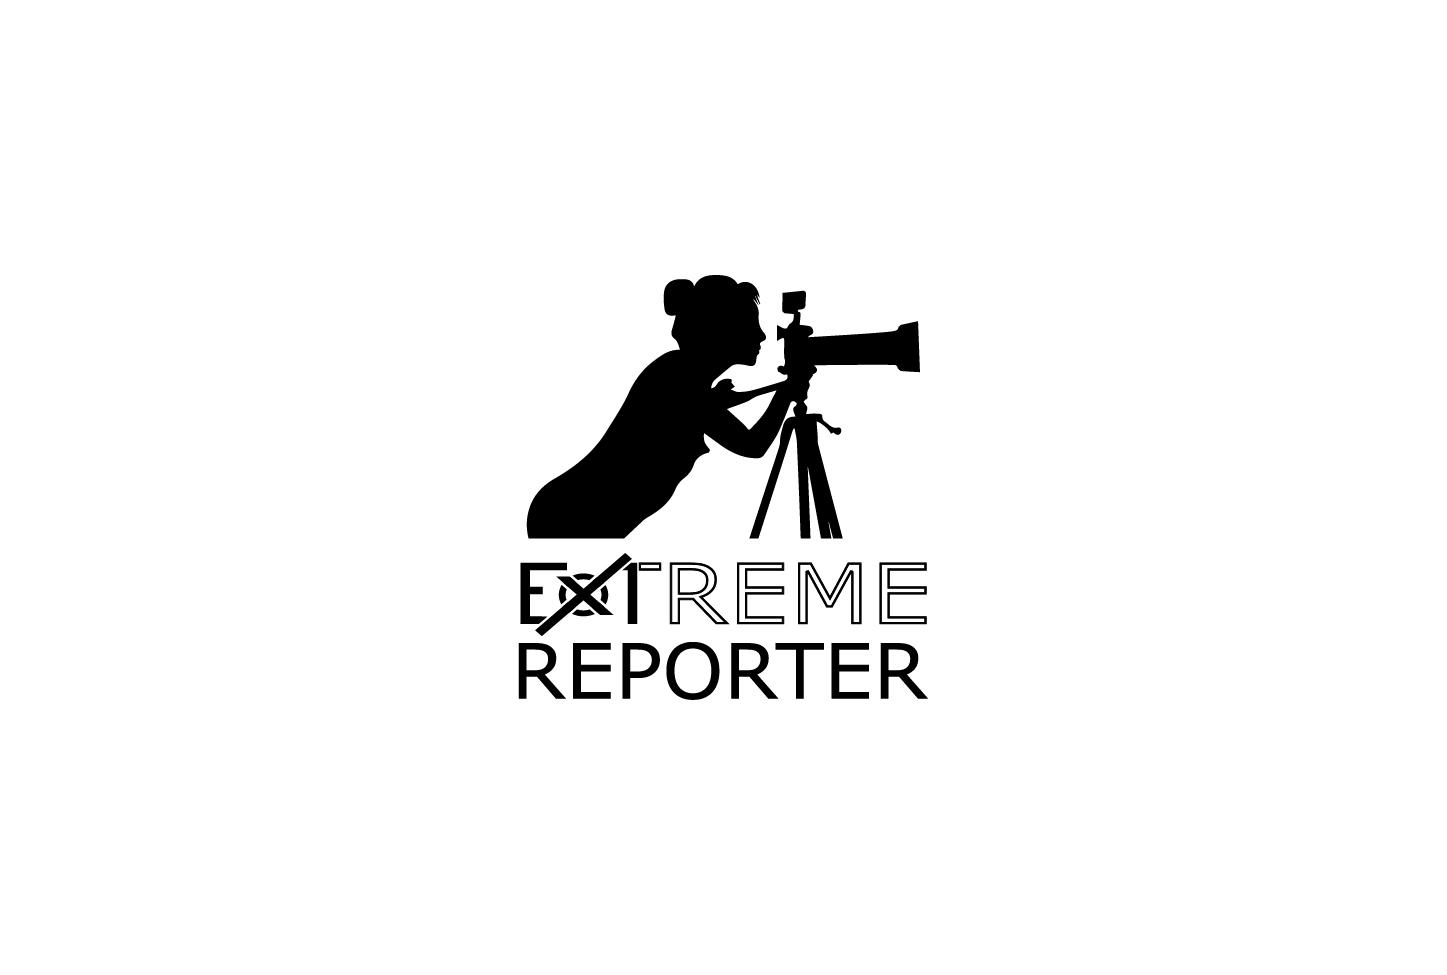 Логотип для экстрим фотографа.  фото f_0145a531d15aec99.jpg